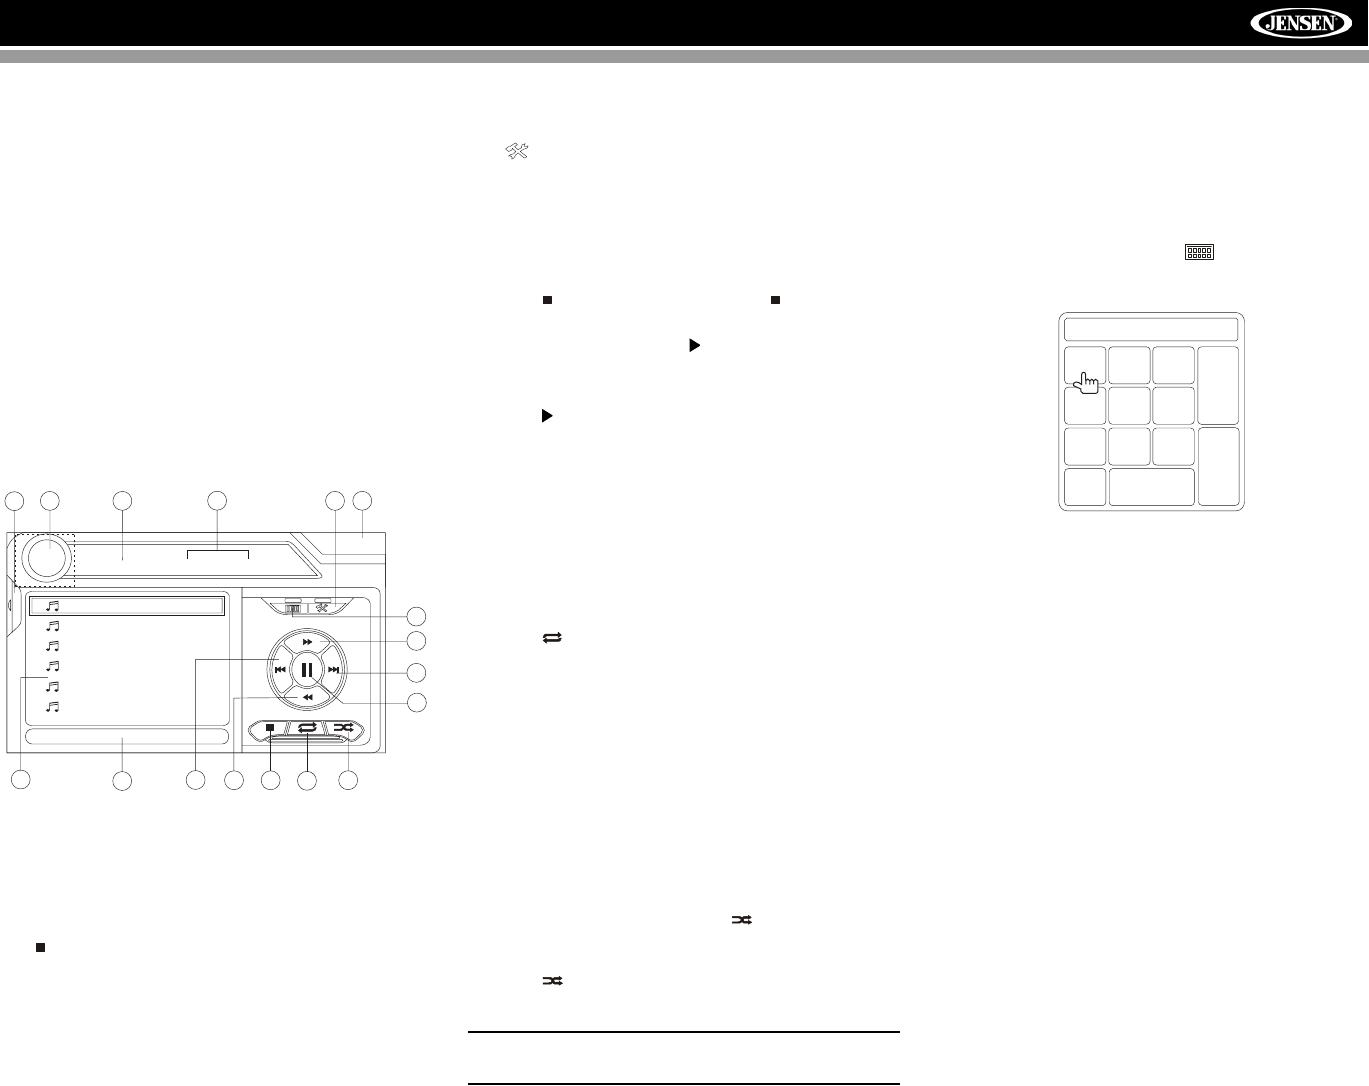 Jensen Vm9412 Users Manual 16 Pin Wiring Harness Diagram 25